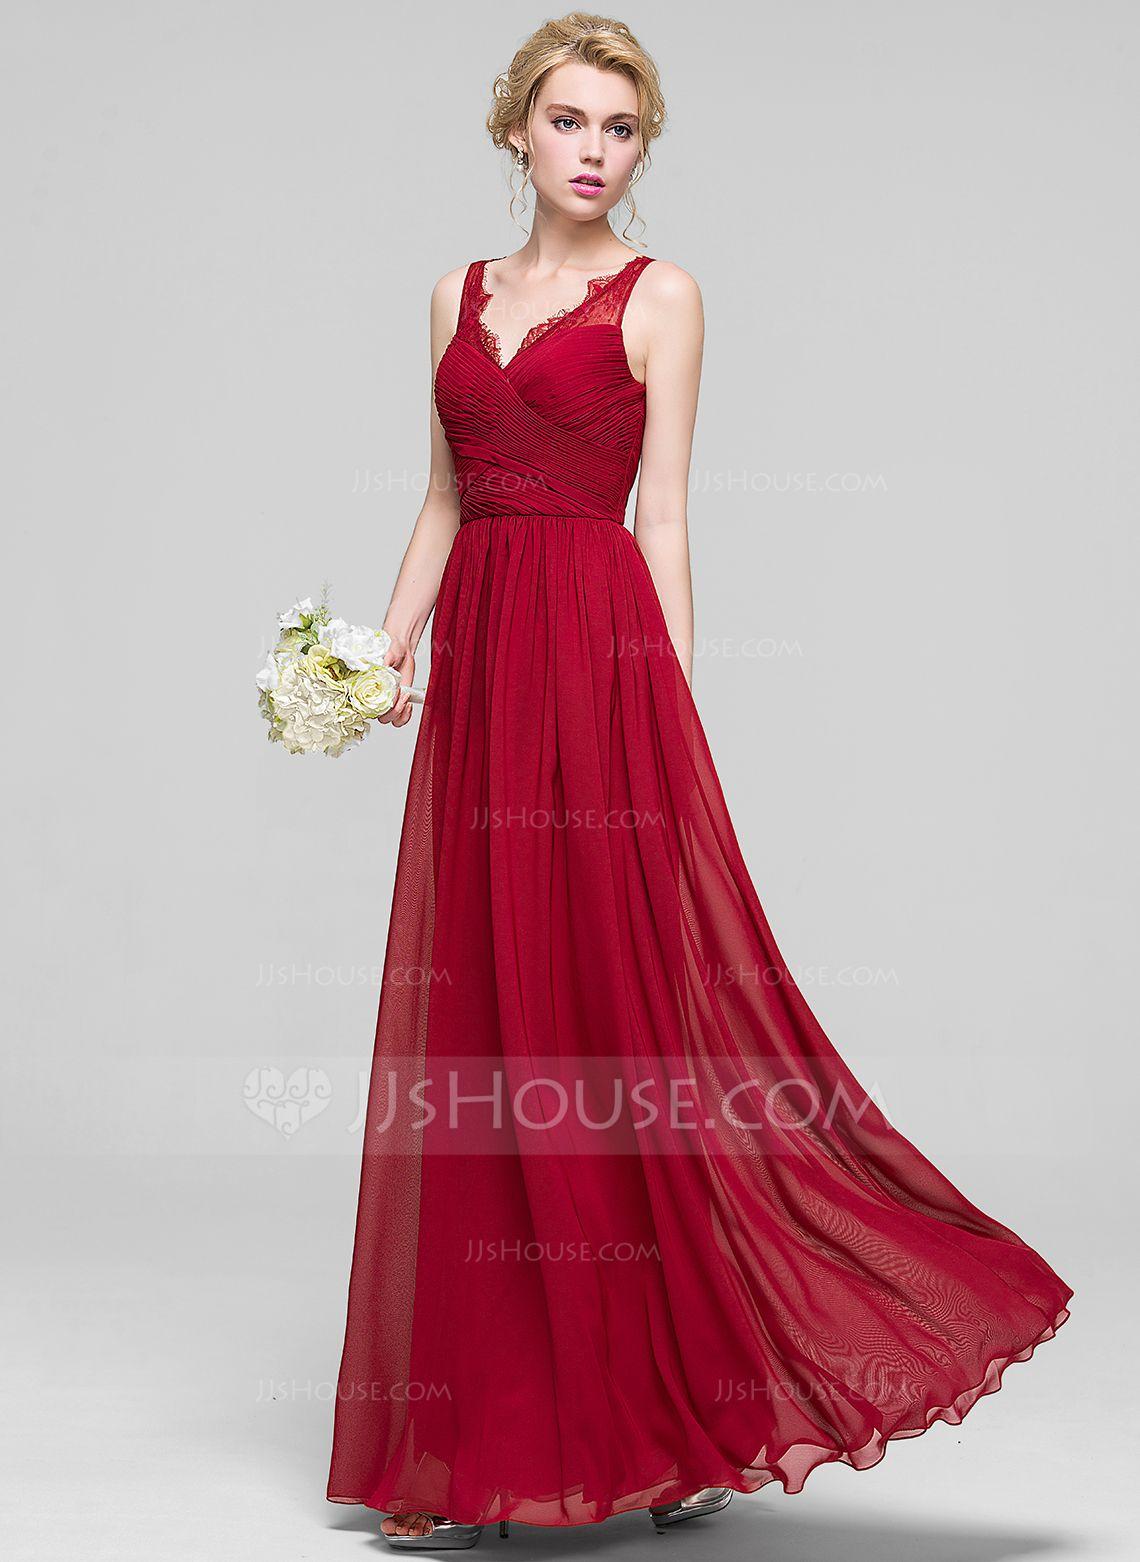 809234e94a1 A-Line Princess V-neck Floor-Length Ruffle Lace Zipper Up Regular Straps  Sleeveless No Burgundy Spring Summer Fall General Plus Chiffon Bridesmaid  Dress